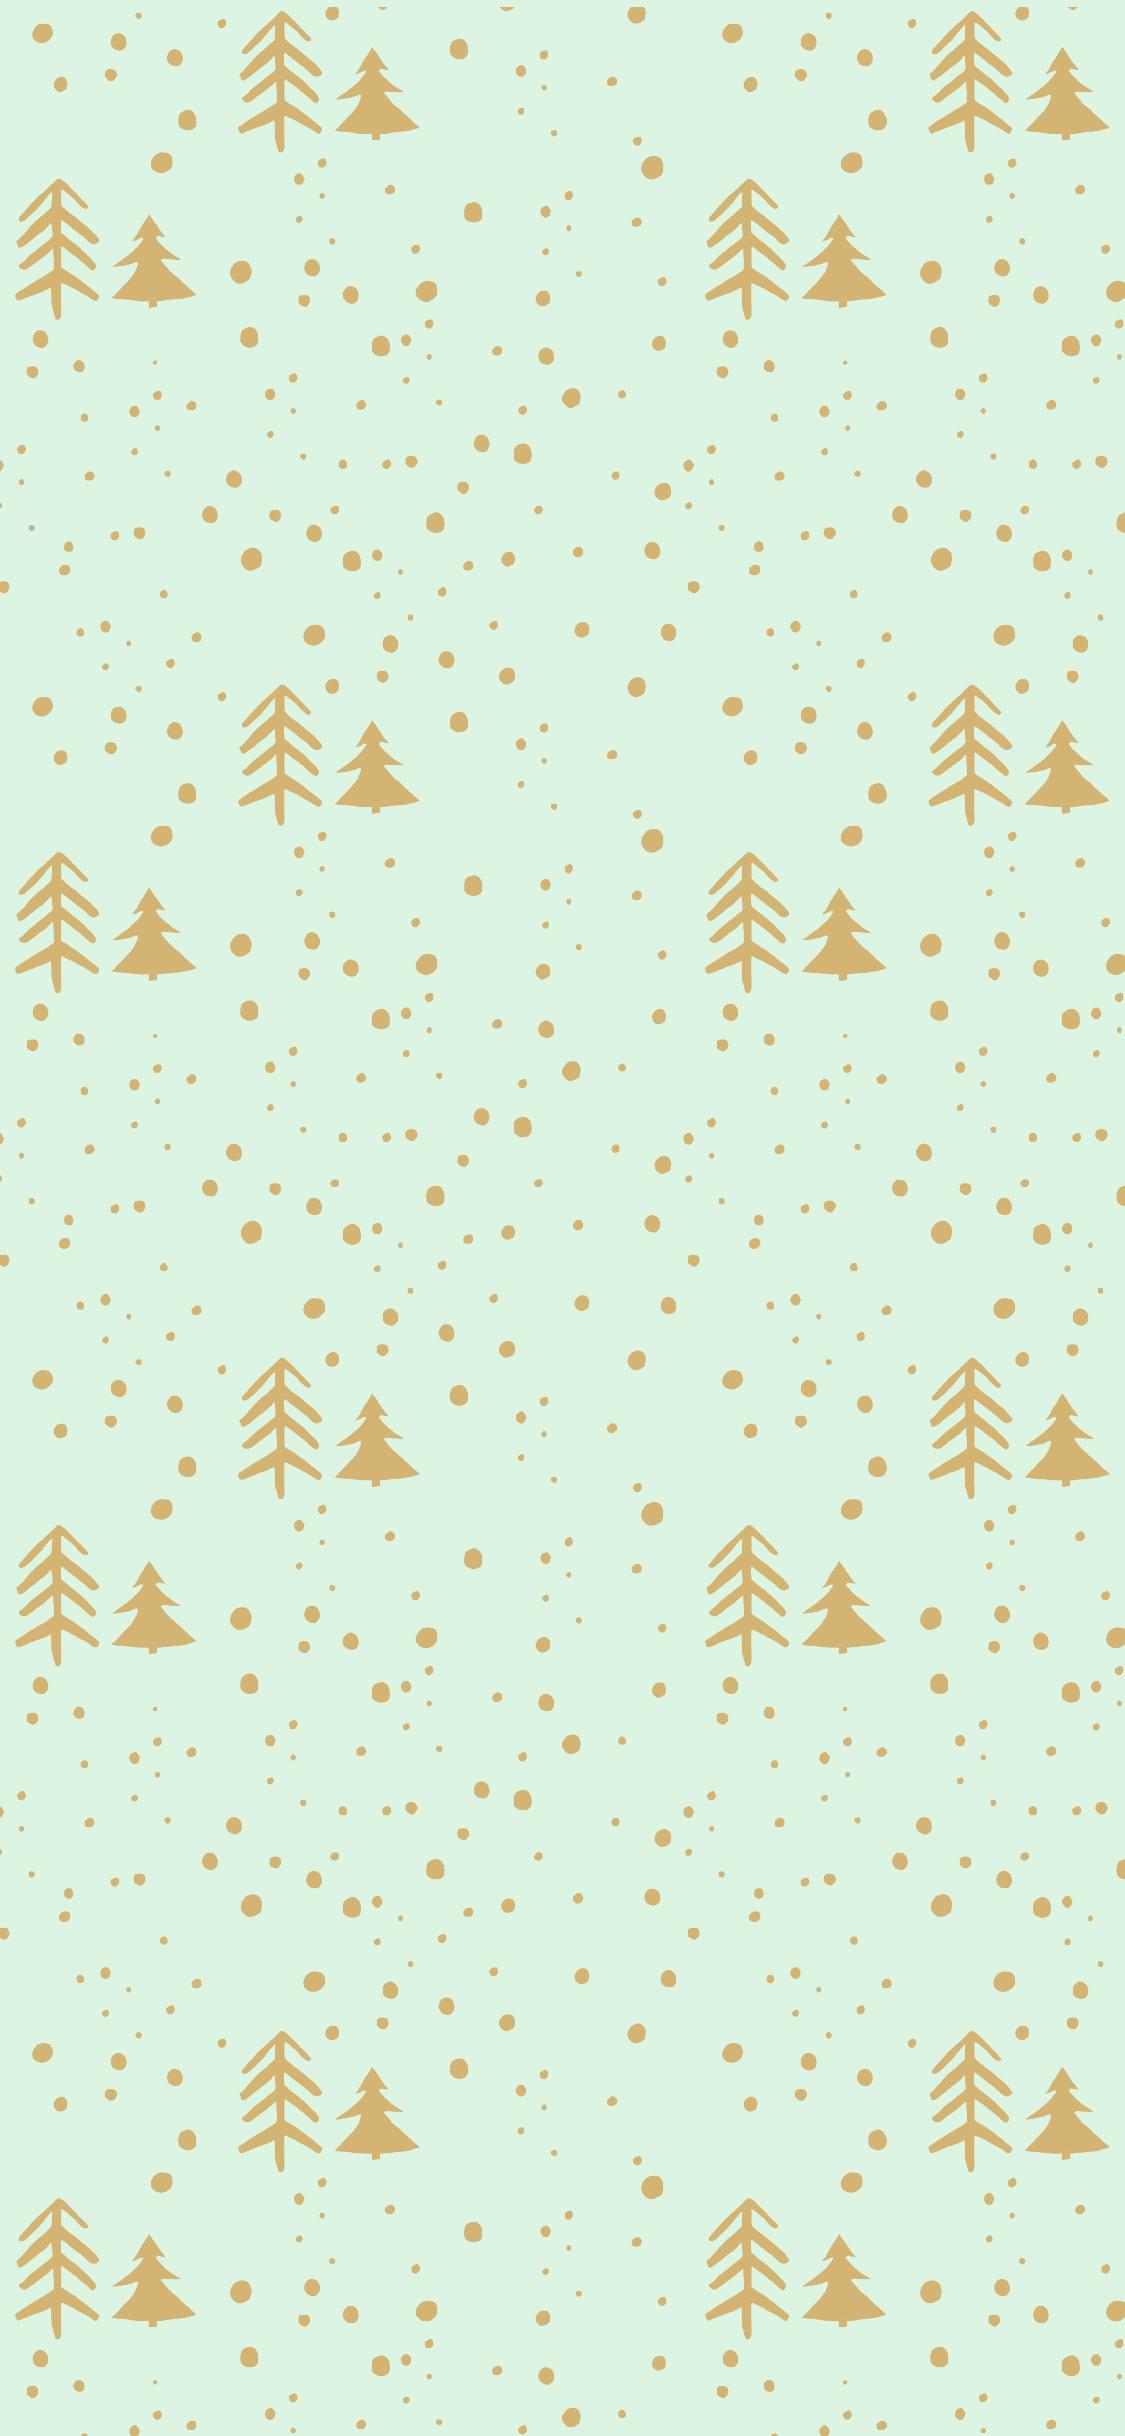 Winter Themed iPhone Wallpapers 2019 #falliphonewallpaper